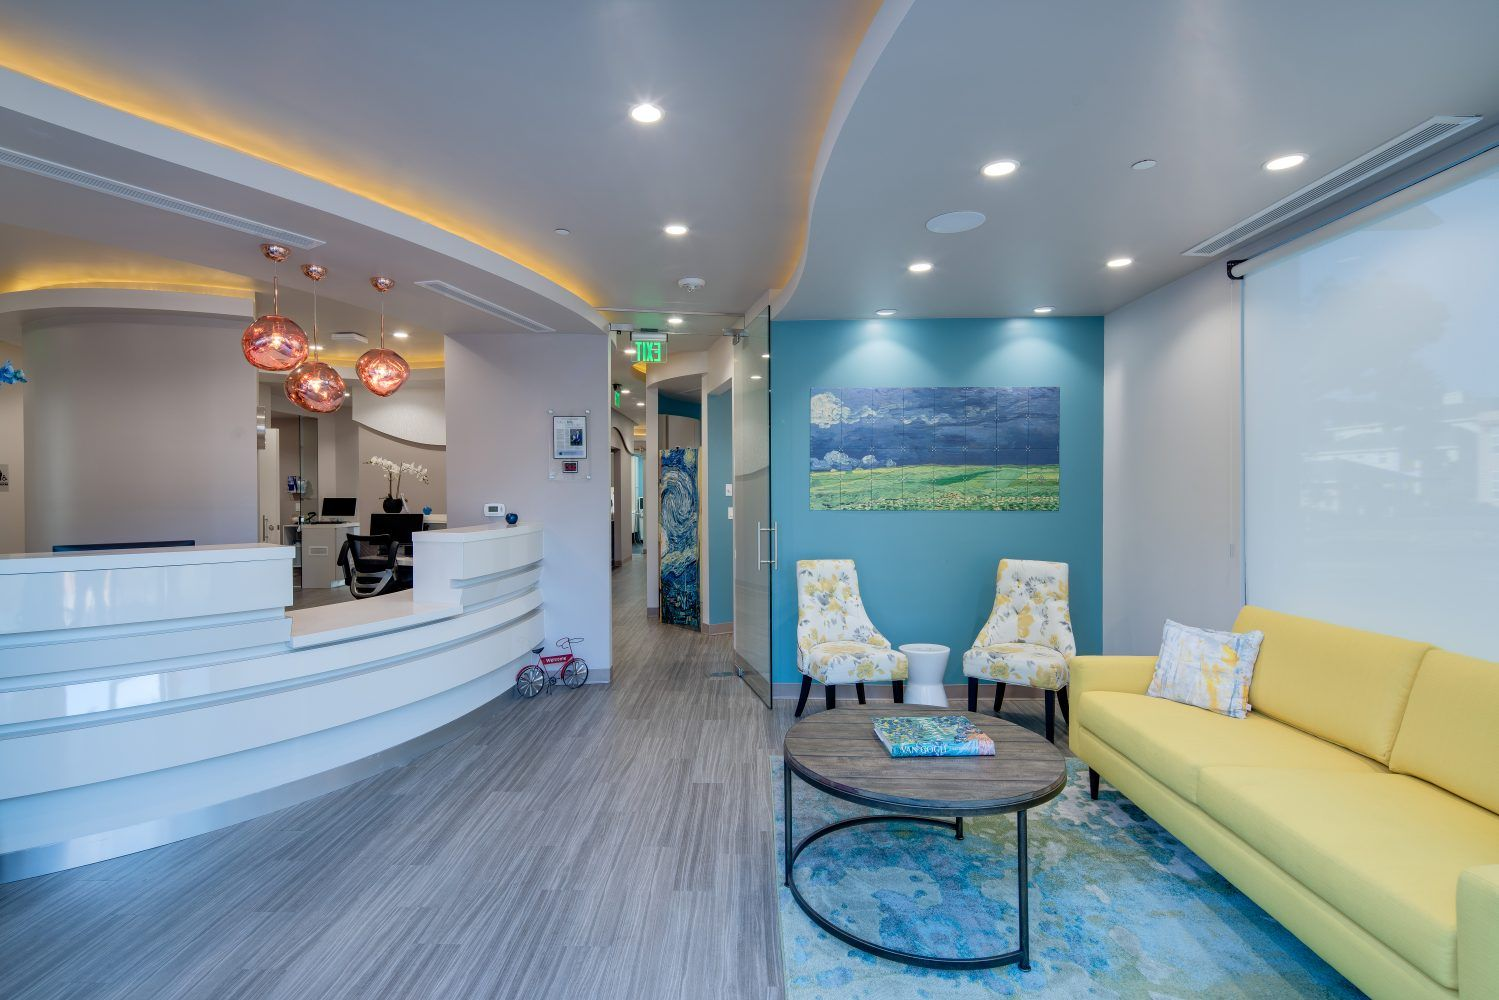 Blue Apple Dental Group Kohan Inc Dental Office Design Interiors Dental Group Interior Design School